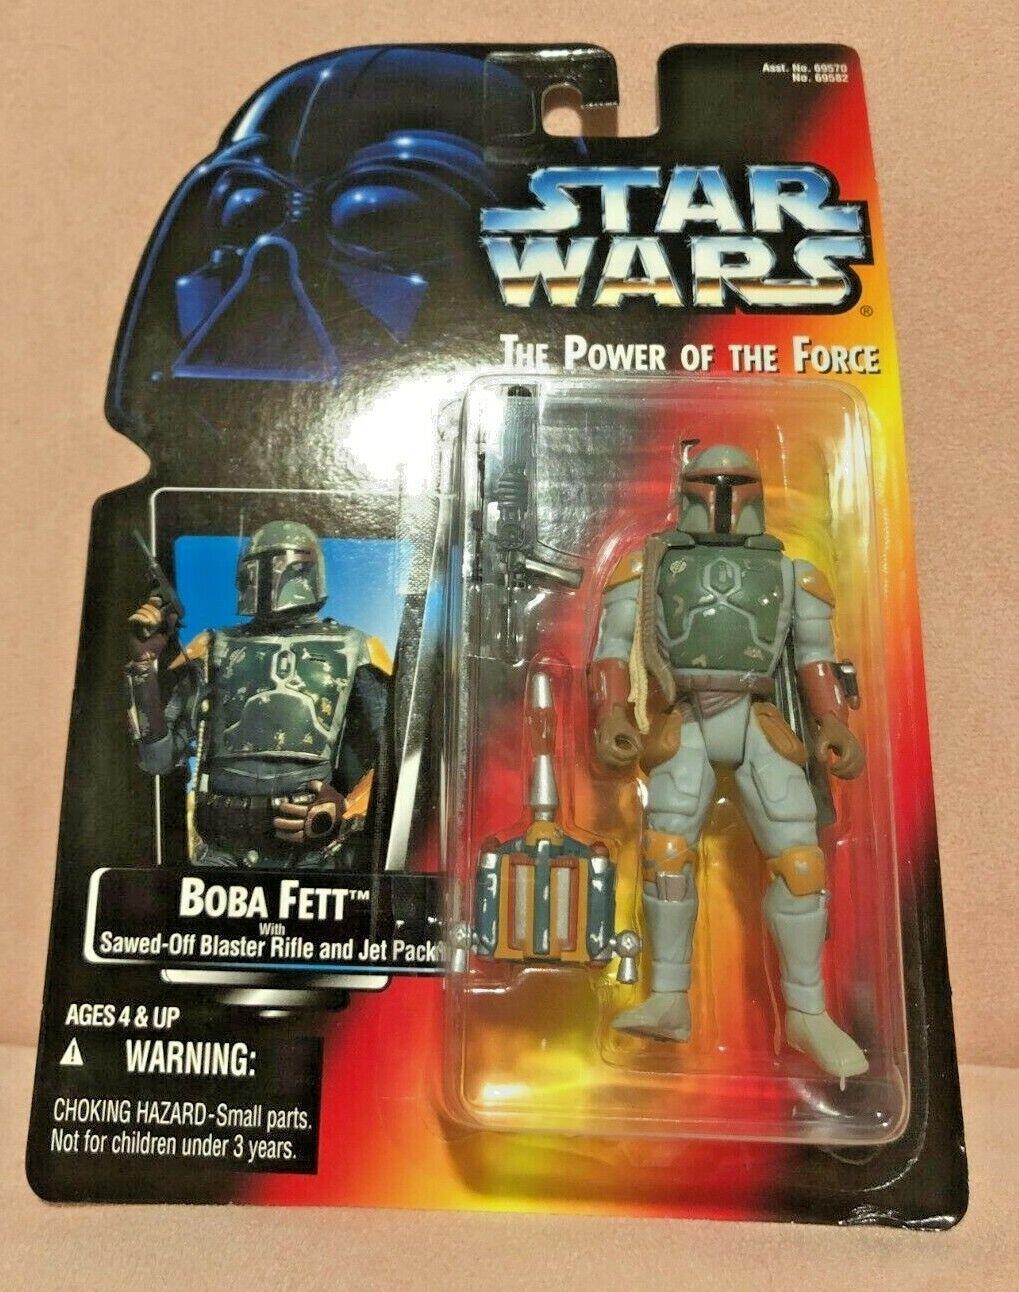 Star Wars Power of the Force Kenner Boba Fett Action Figure NRFP